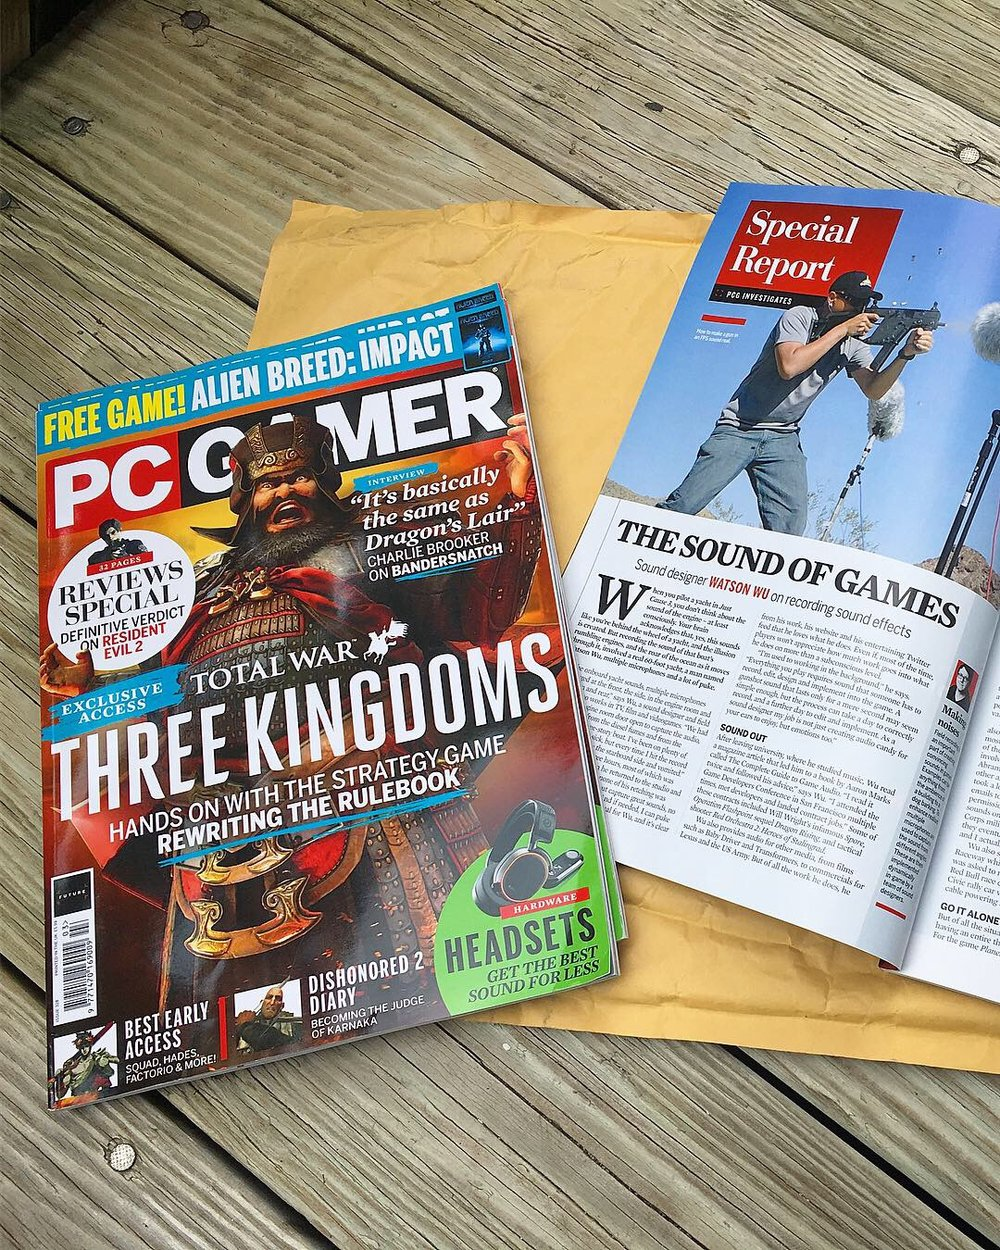 PC Gamer Magazine - March 2019 UK Edition